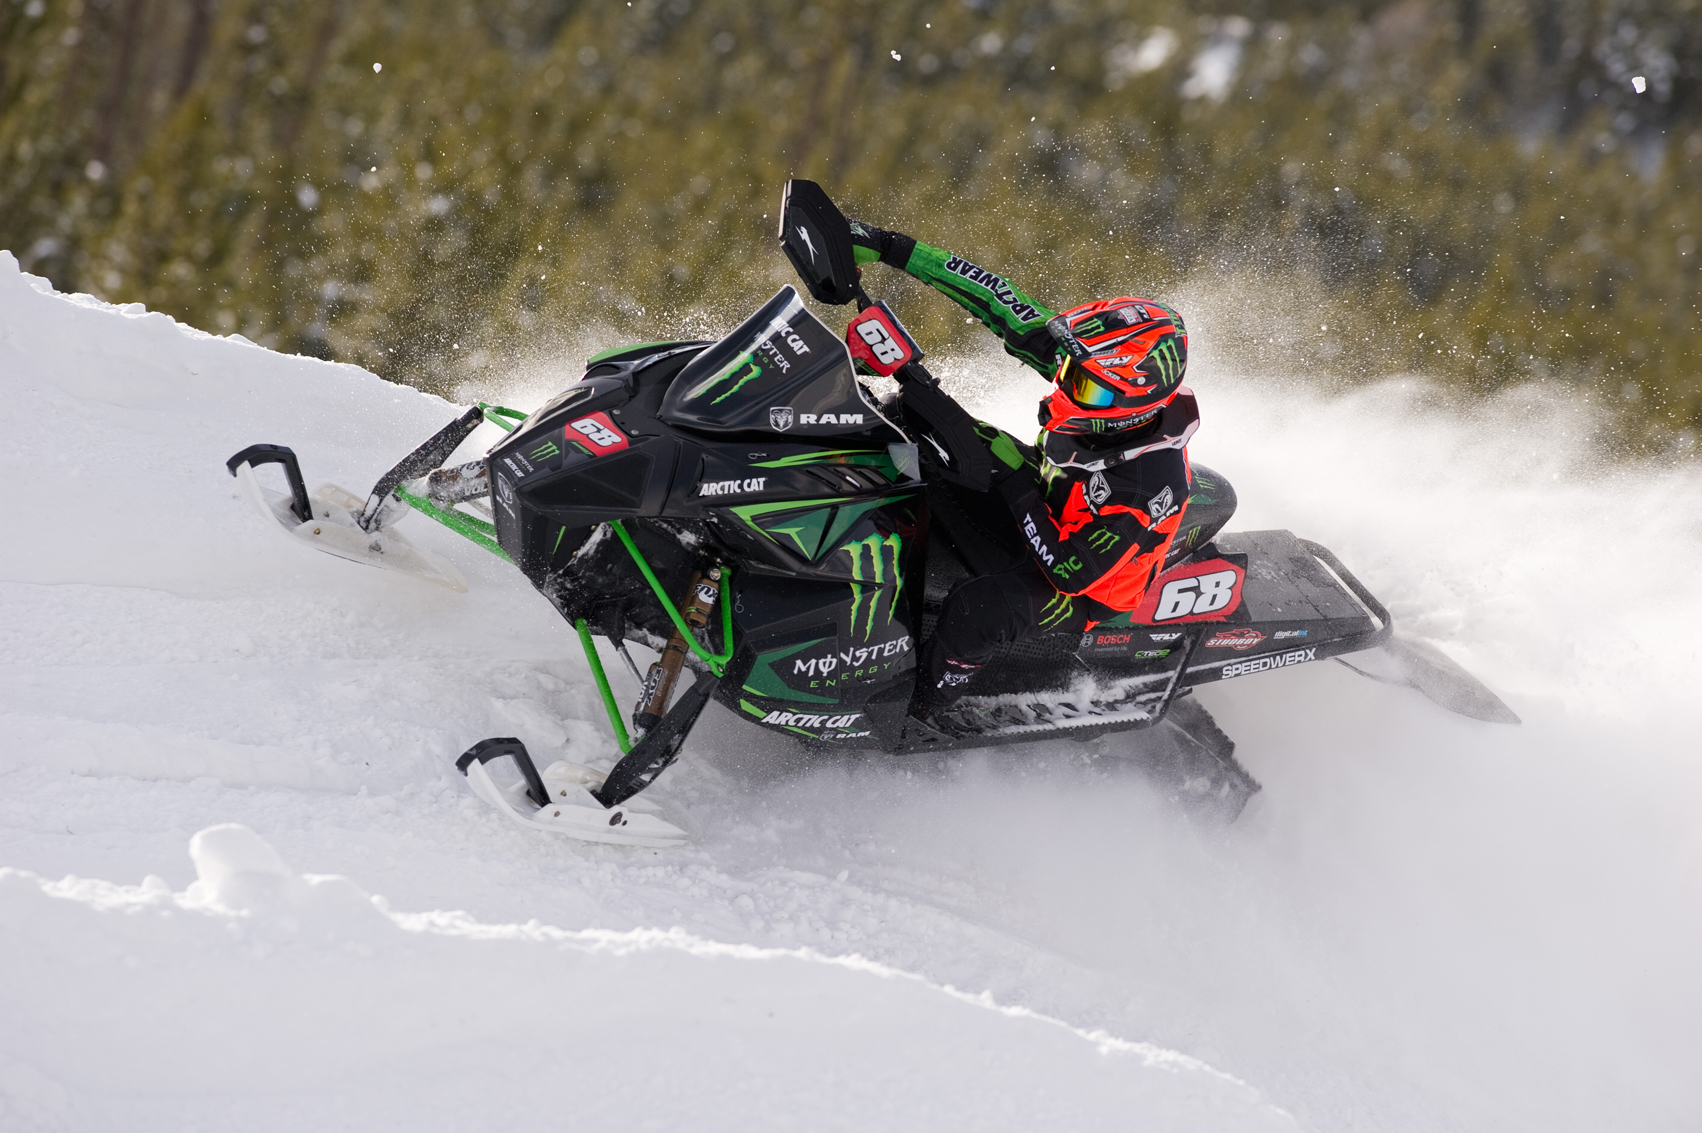 Hibbert focused on gold medal nine-peat at X Games Aspen 2016